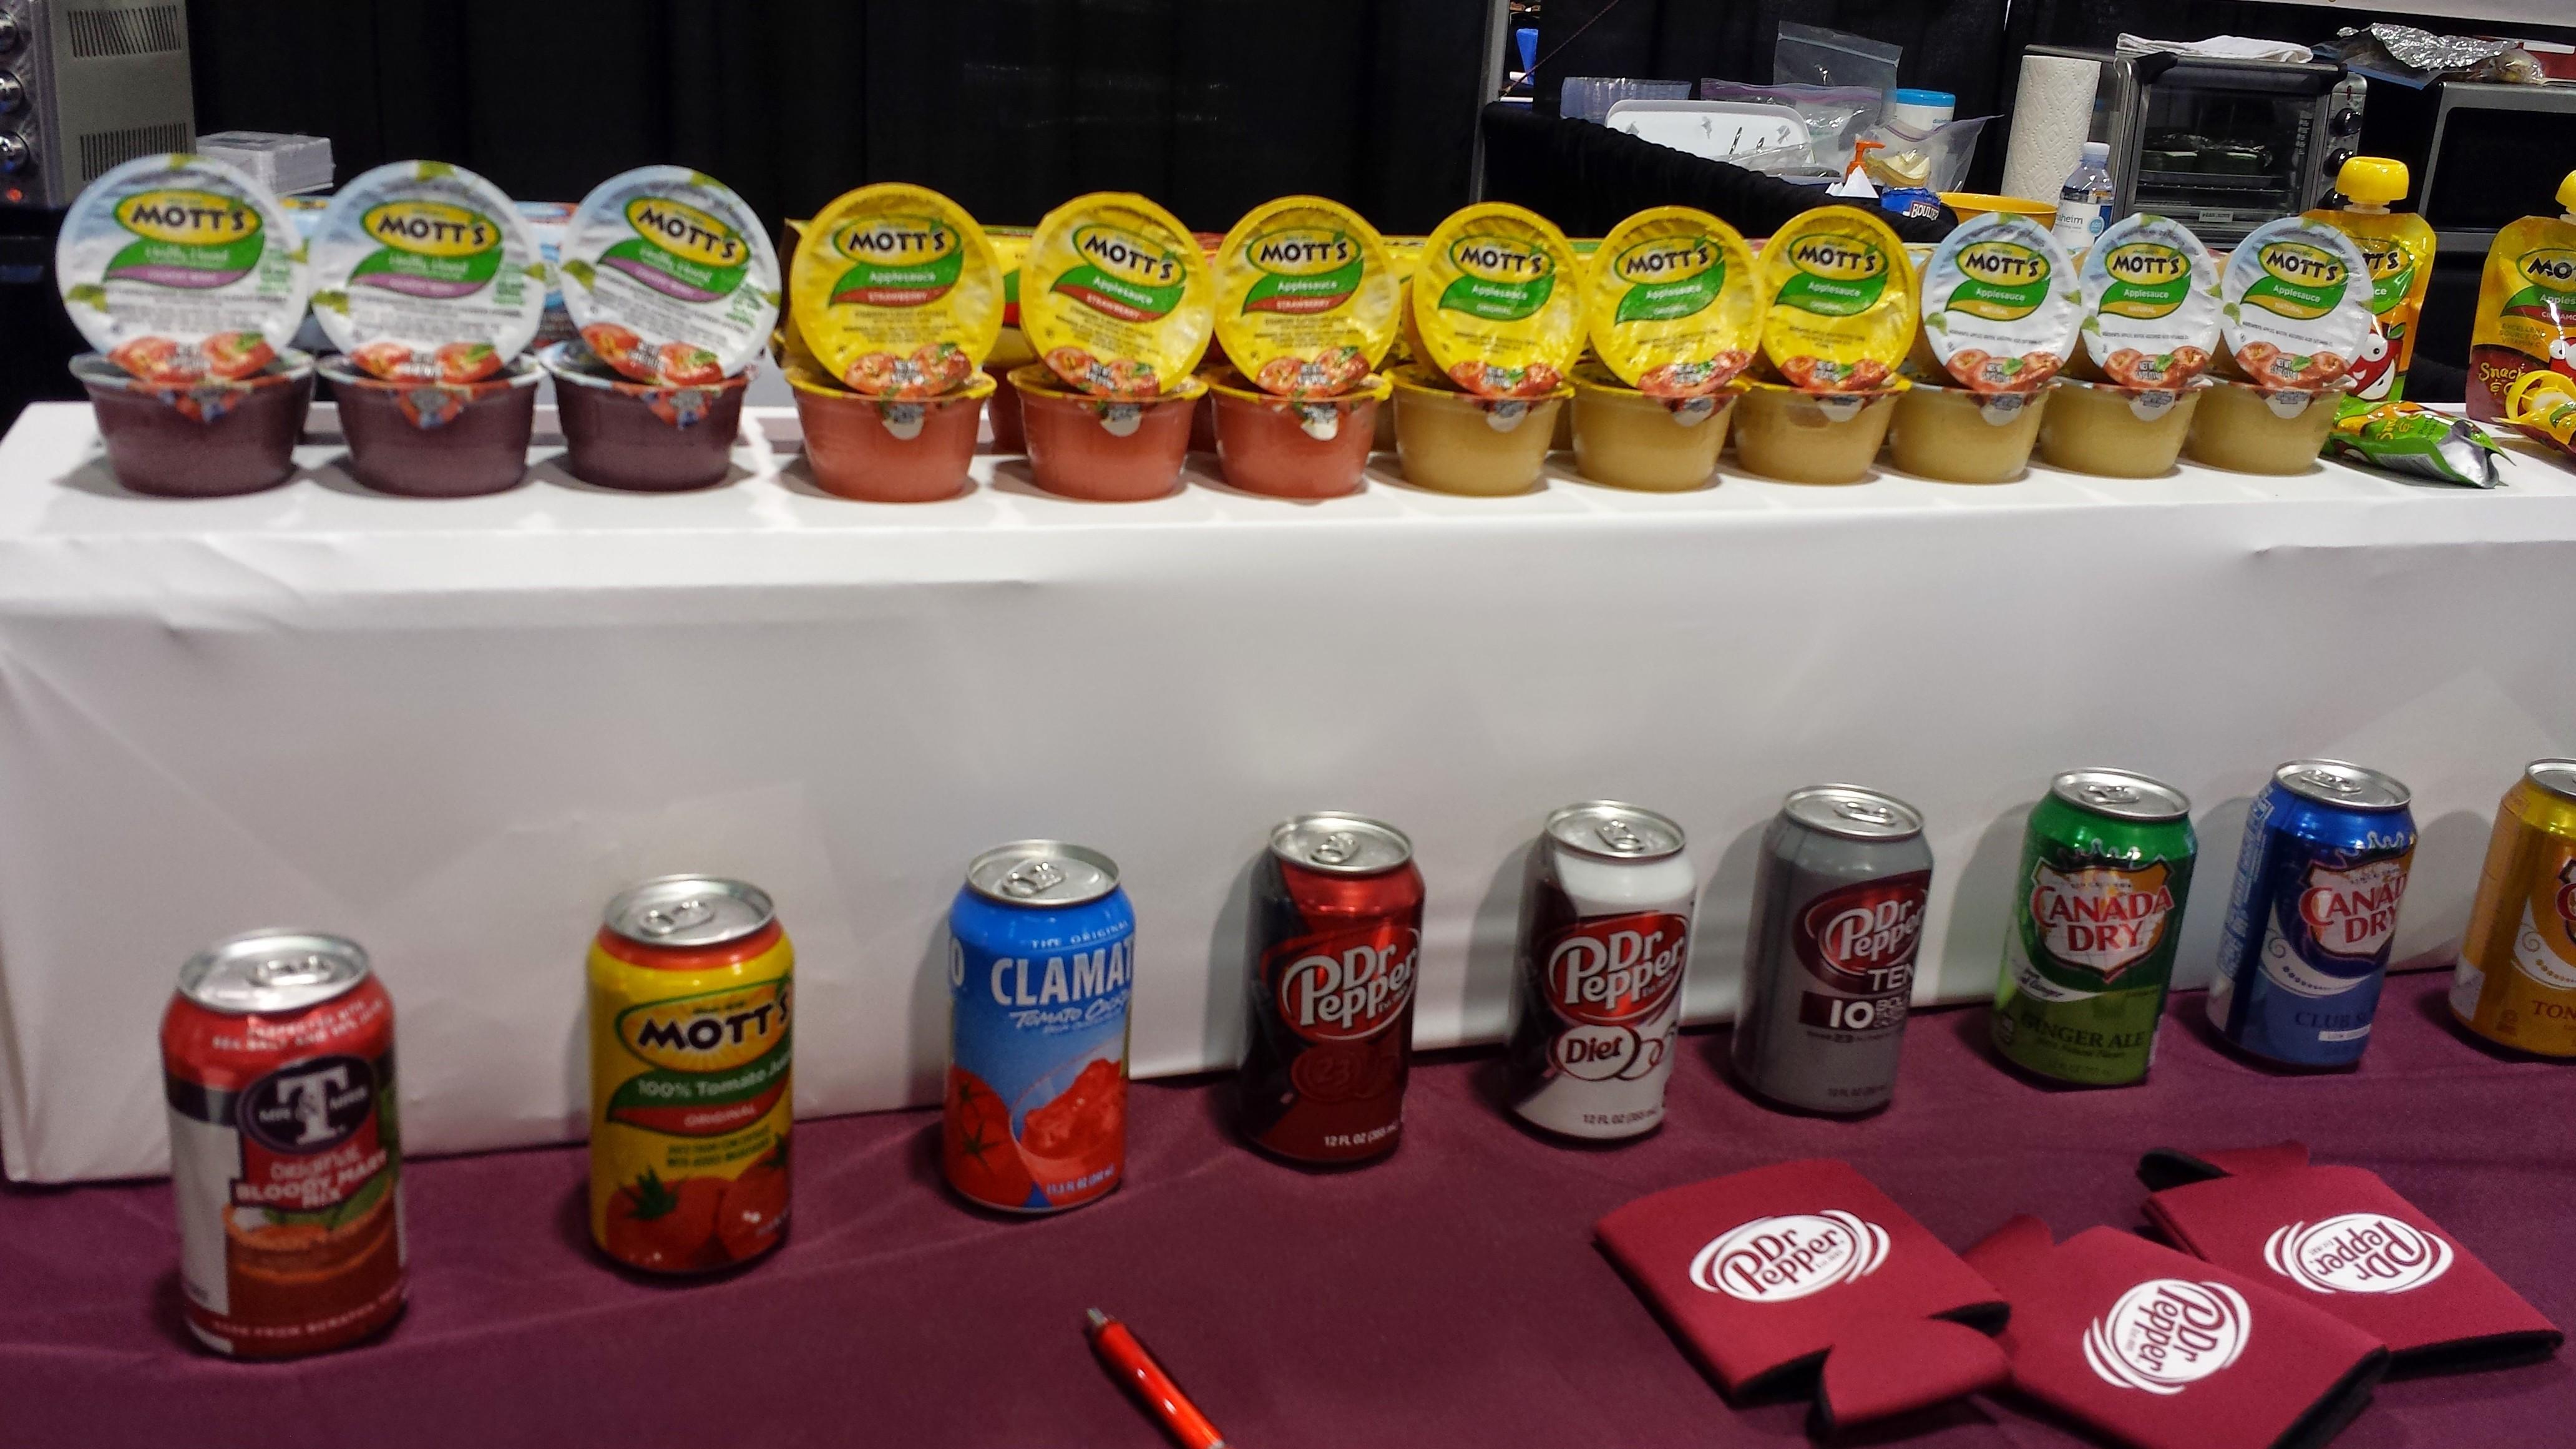 Food display at APEX Expo 2014